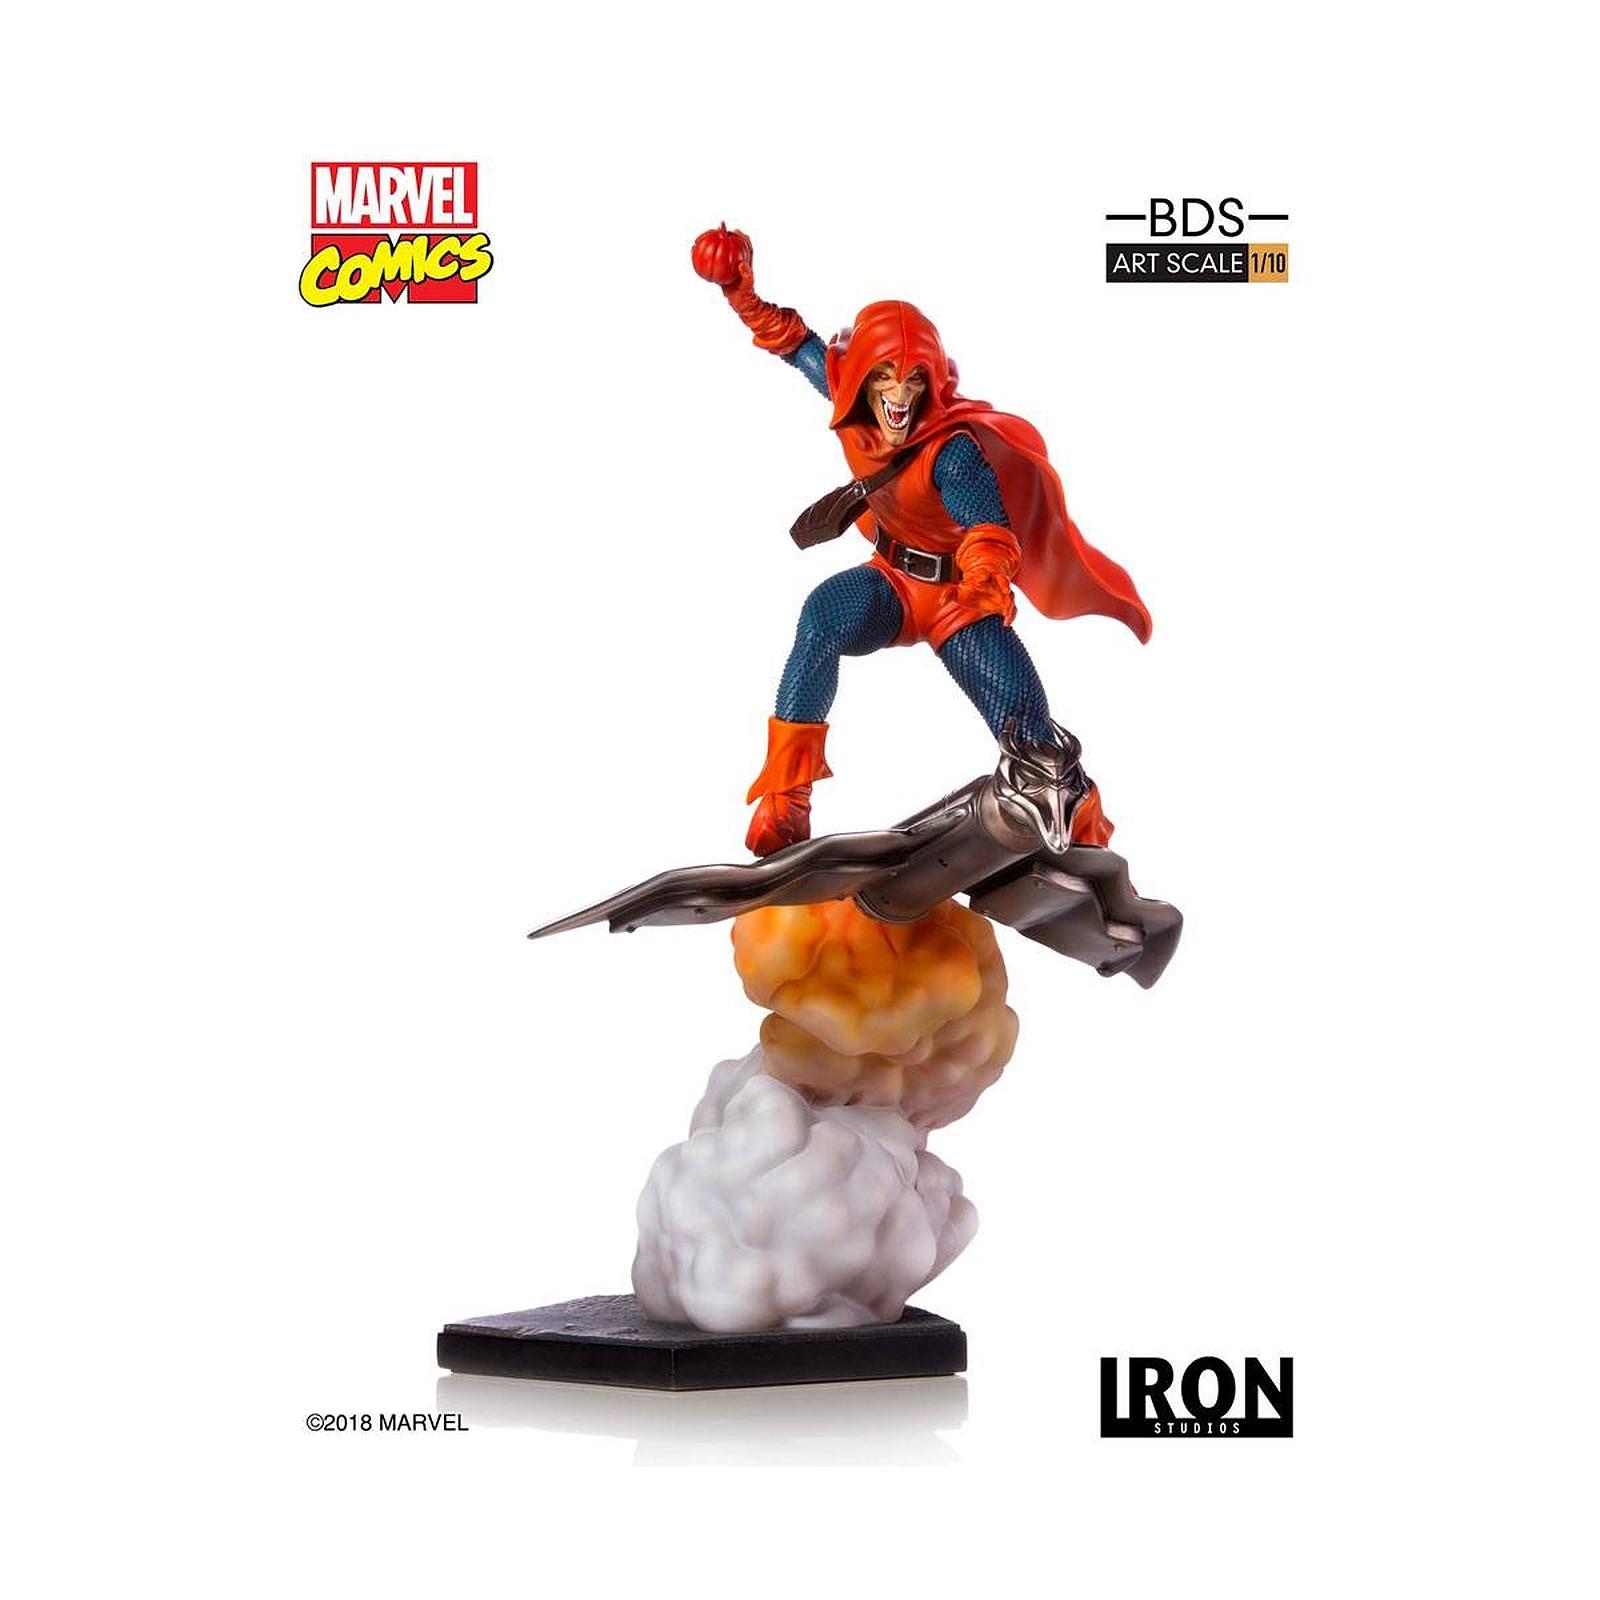 Marvel Comics - Statuette 1/10 BDS Art Scale Hobgoblin 30 cm